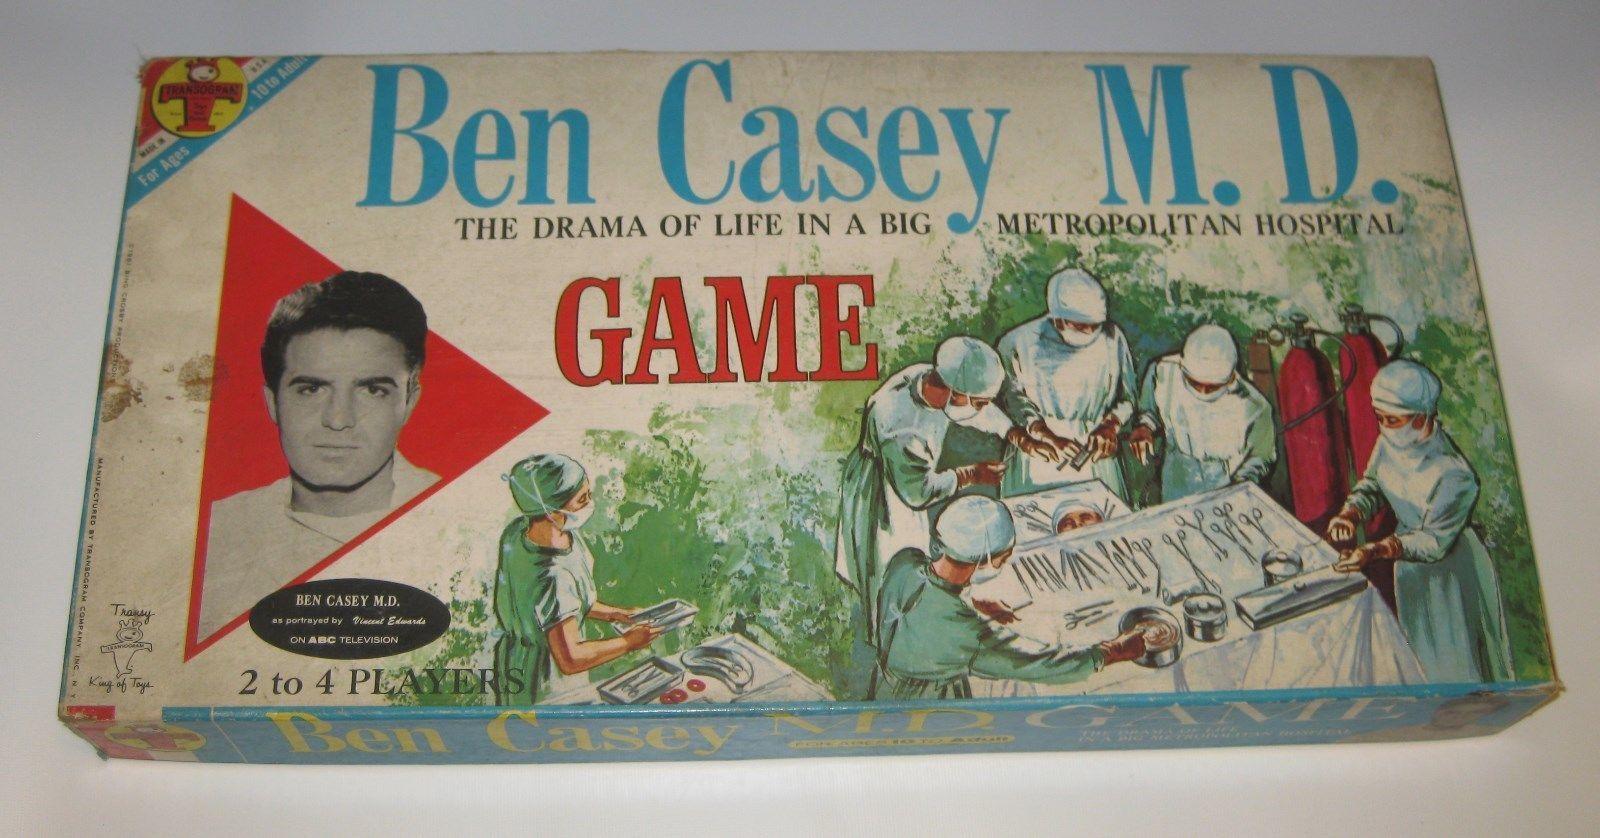 Transogram 3828-198 -- 1961 Ben Casey M.D. - Drama of Life in Big Metro Hospital